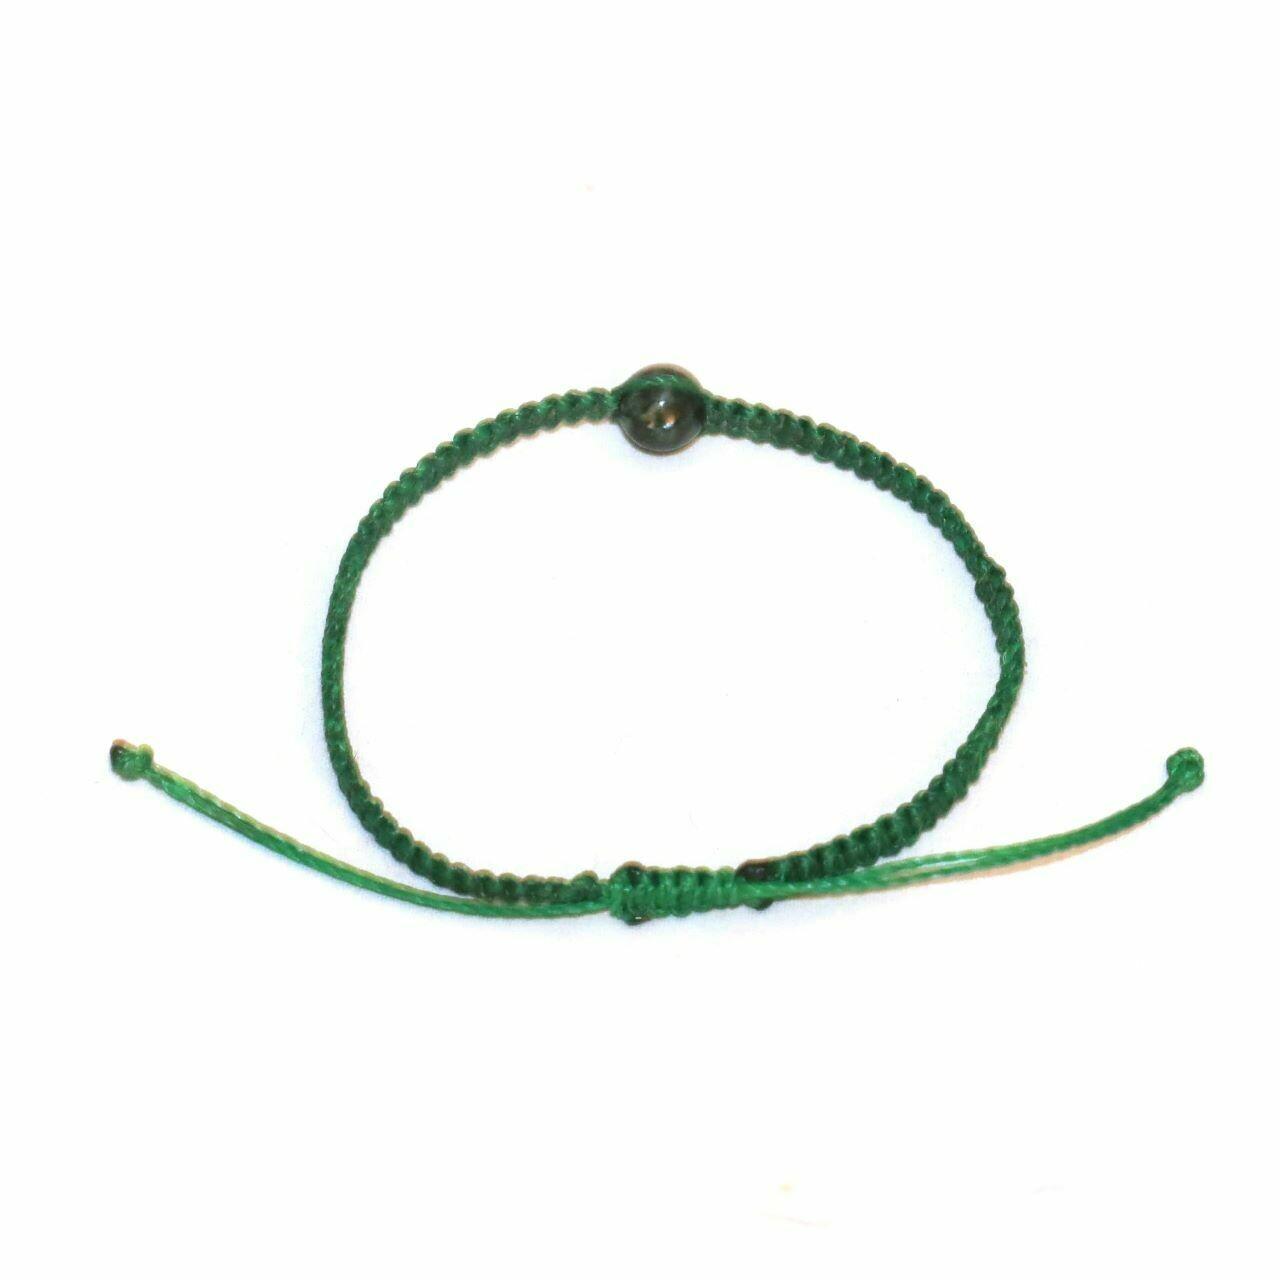 Wholeness Jade Bracelet